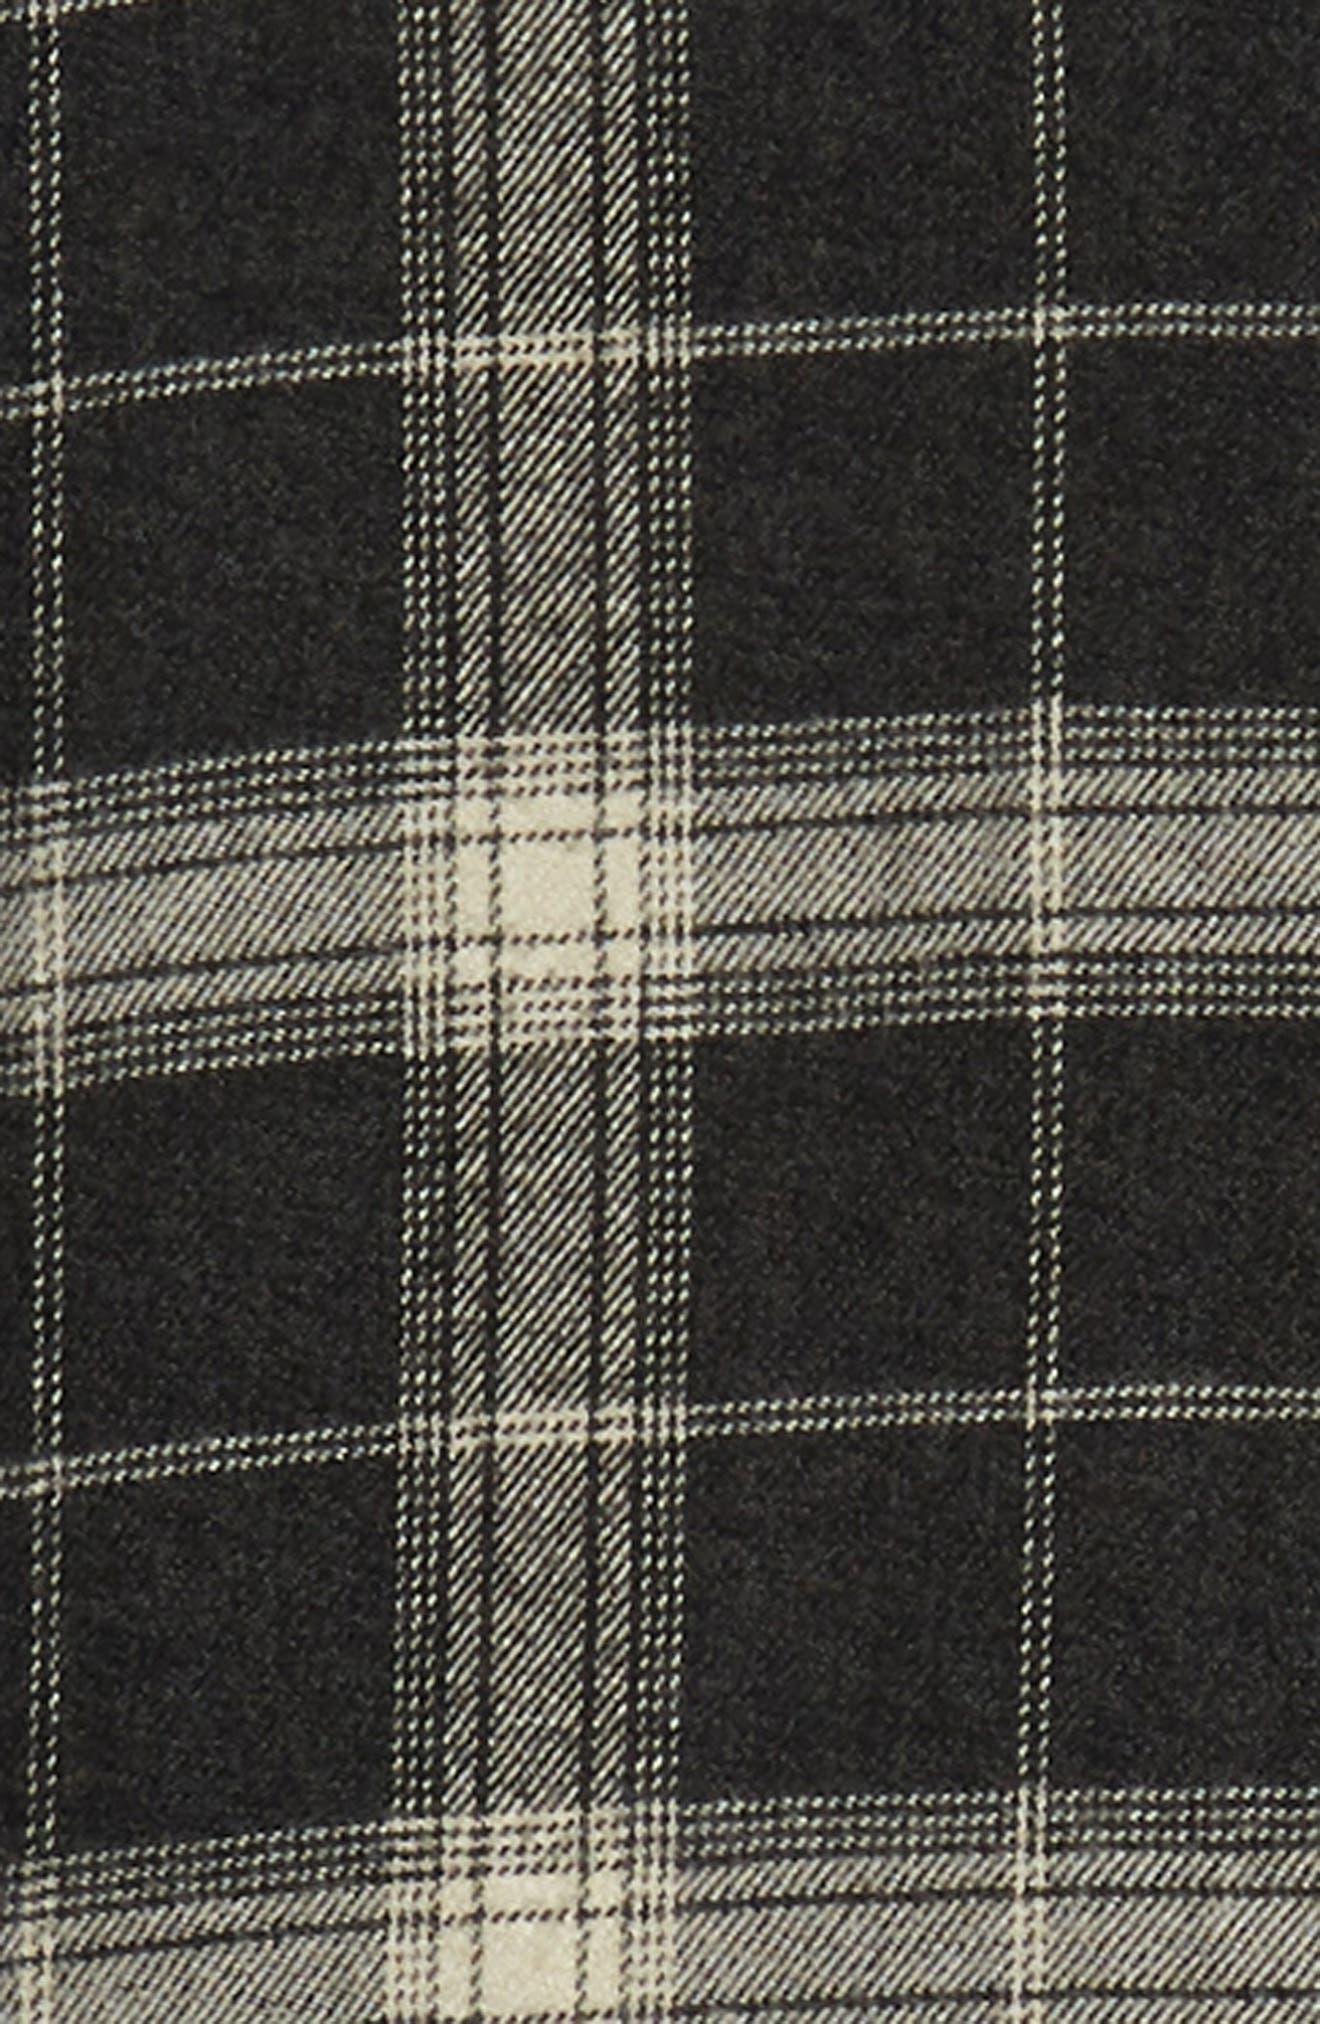 Forrest Regular Fit Plaid Flannel Sport Shirt,                             Alternate thumbnail 6, color,                             COAL/ IVORY